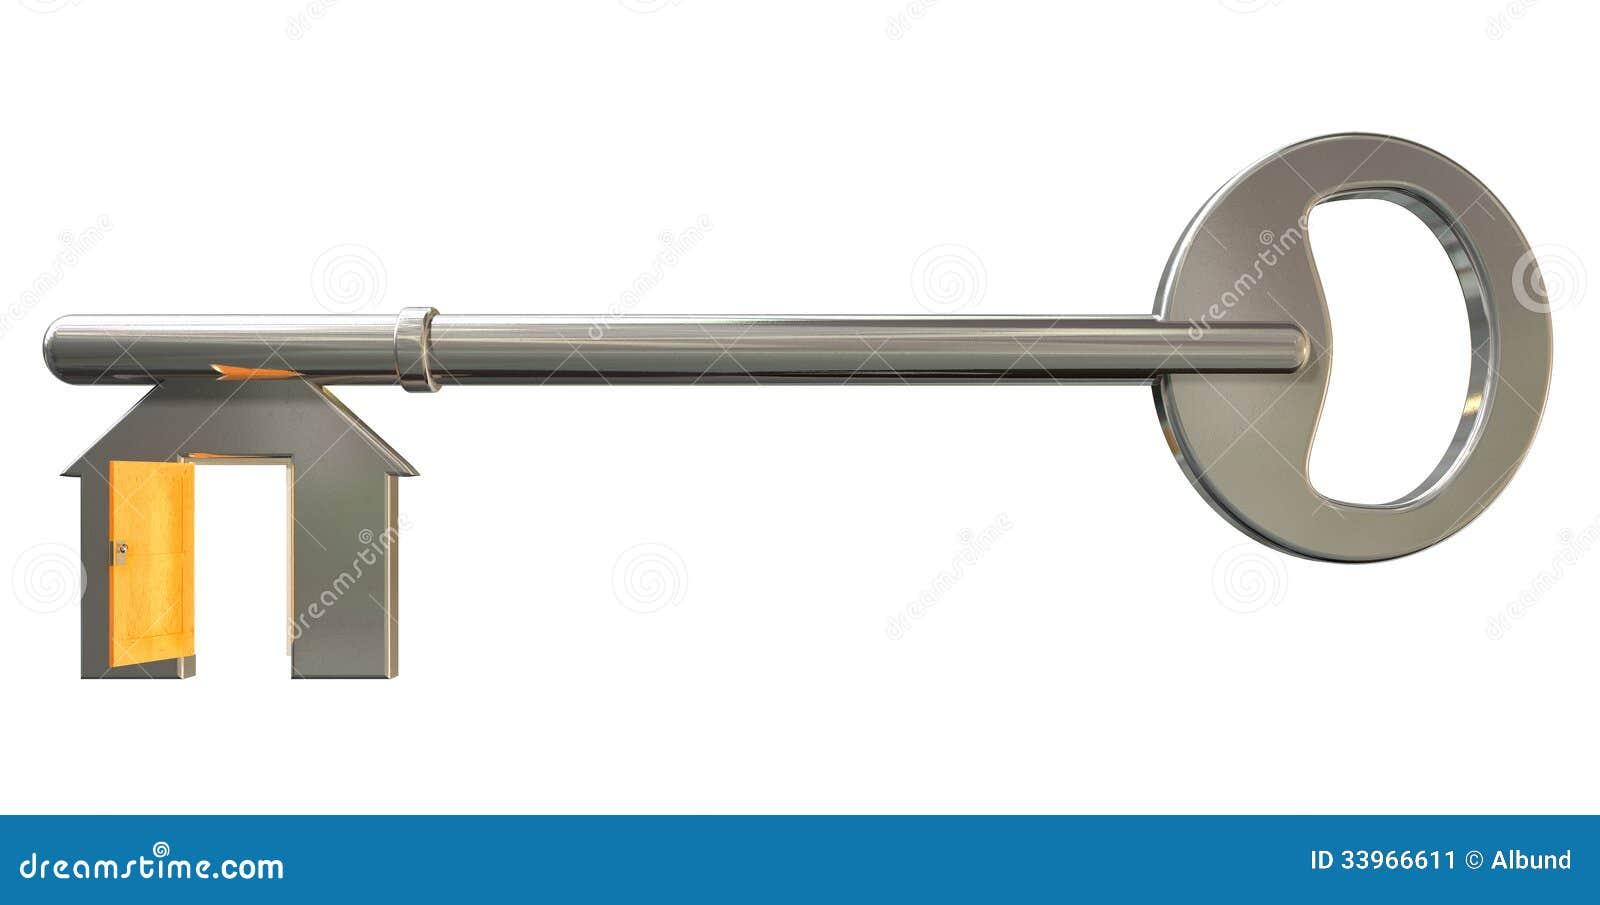 Superieur House Key With Open Door Insert